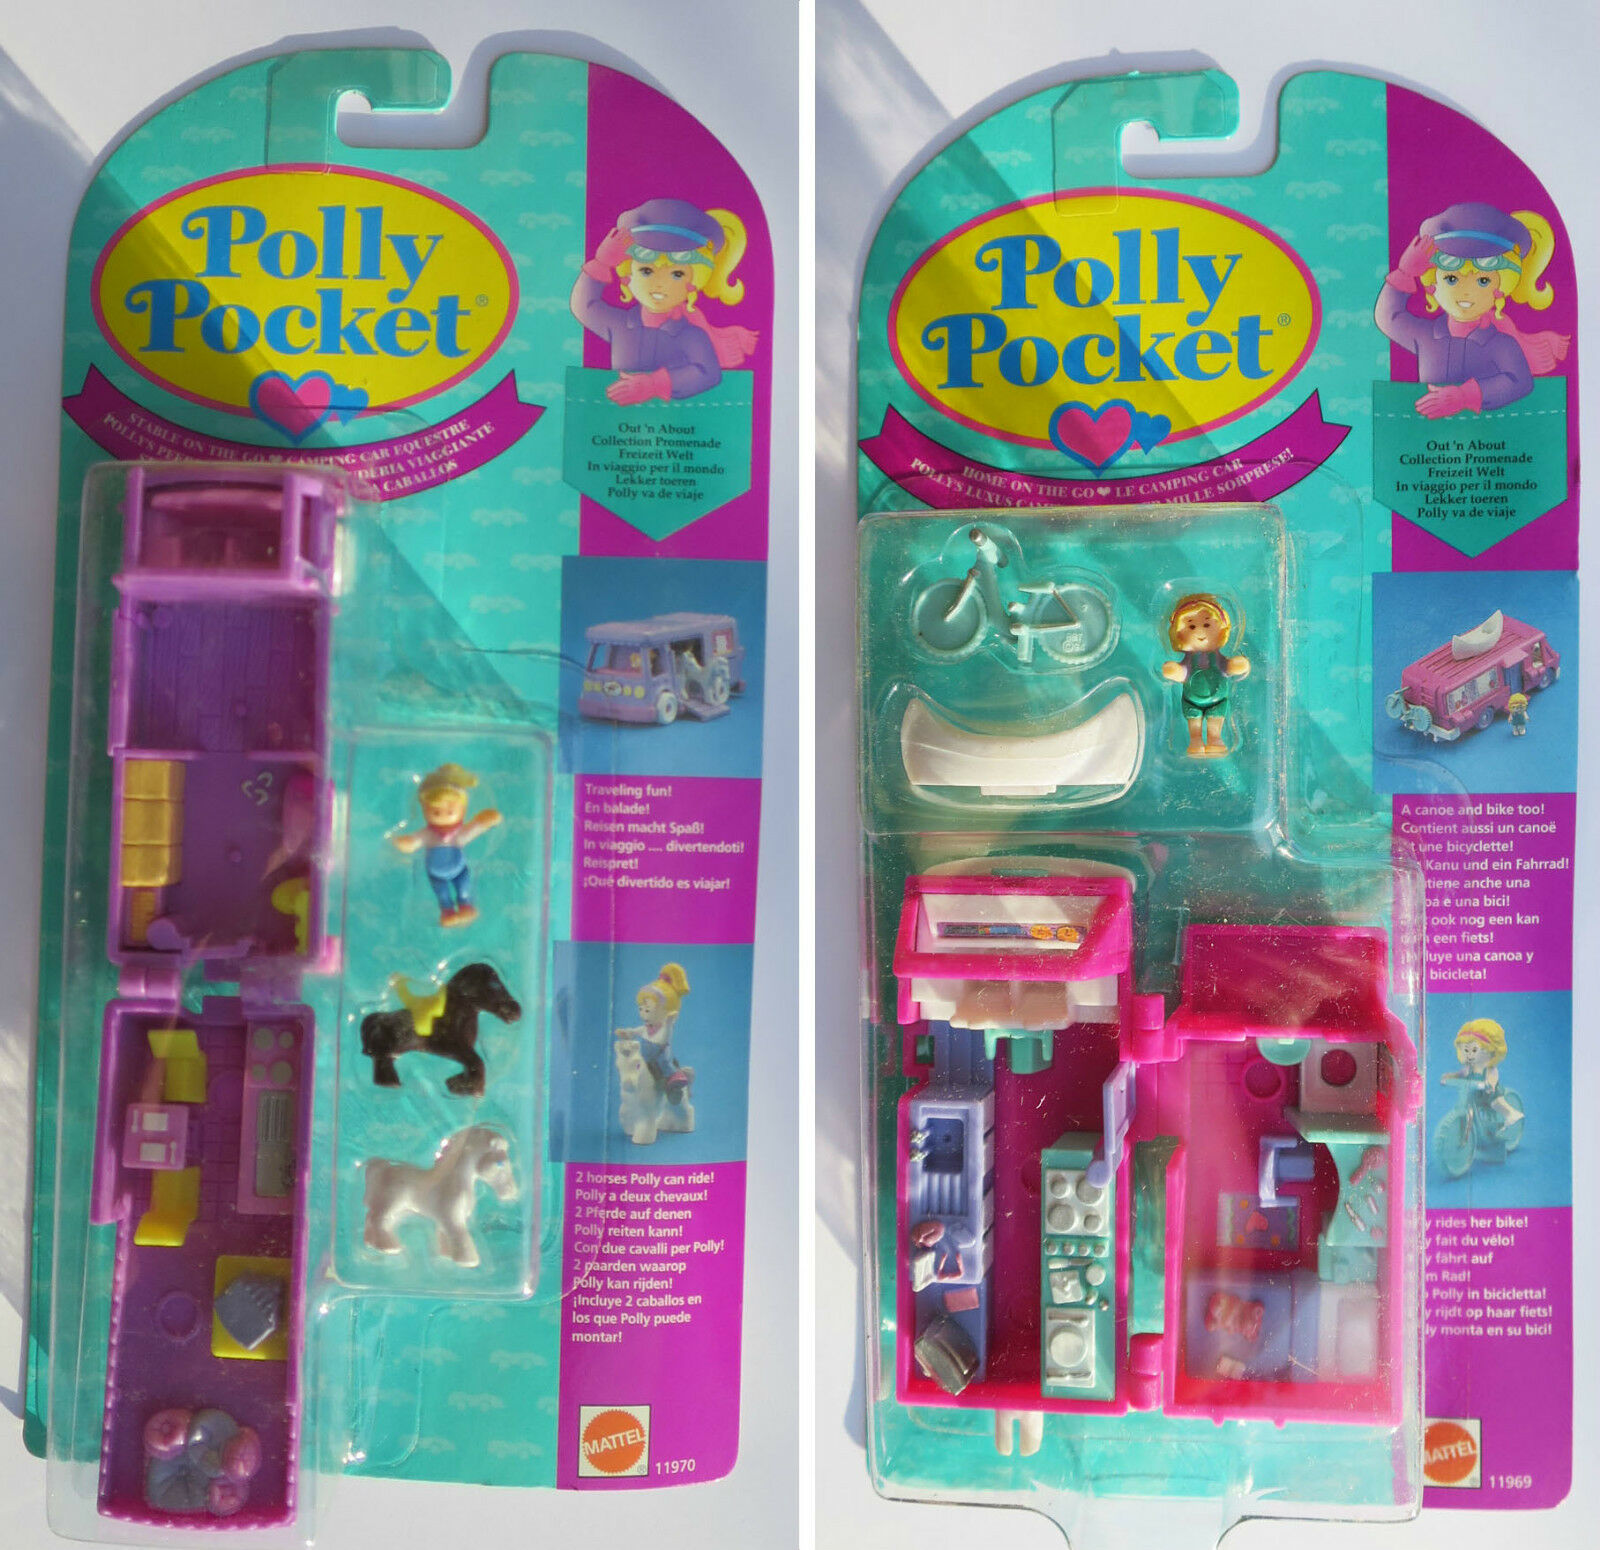 Nuevo Mini Polly Pocket 1994 Home on the go & stable Go casa rodante azulbird